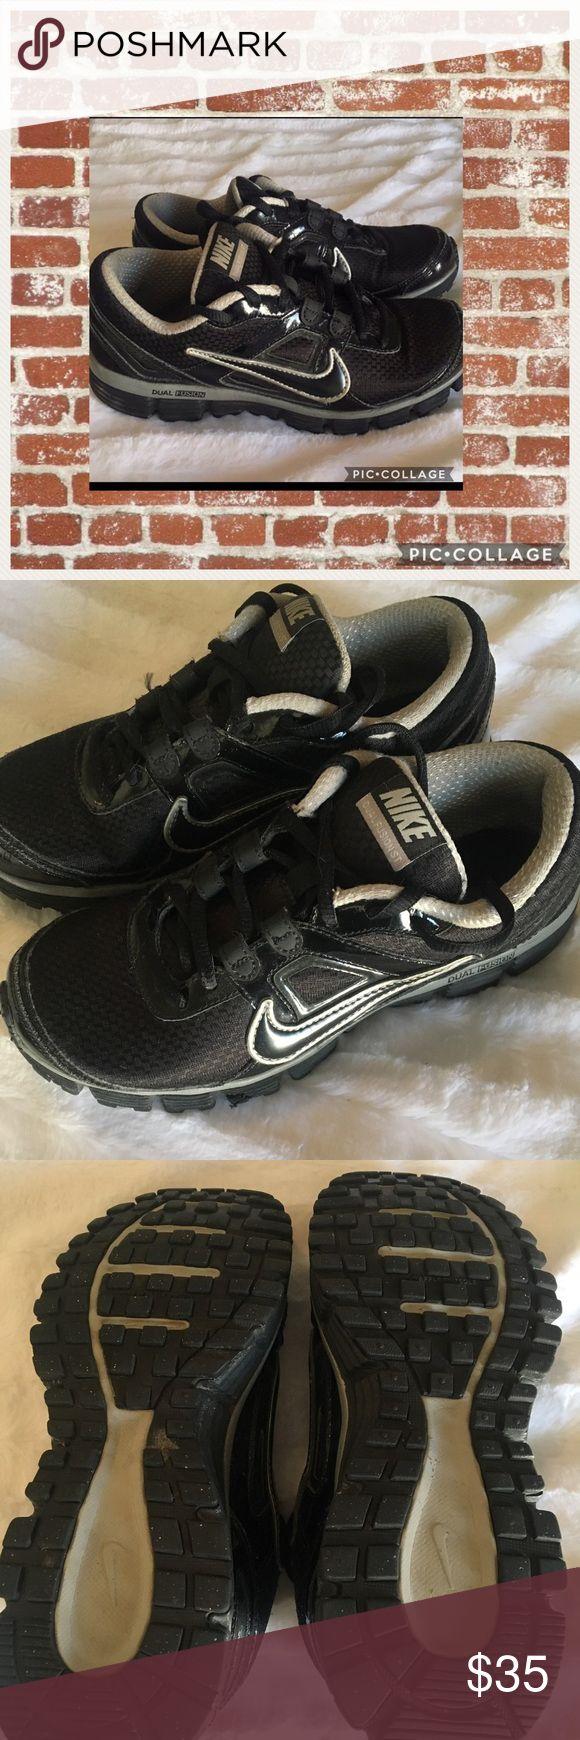 Black Nike Dual Fusion Size: 7 (Women's) Gently Worn Nike Dual Fusions- Women's 7 Nike Shoes Sneakers